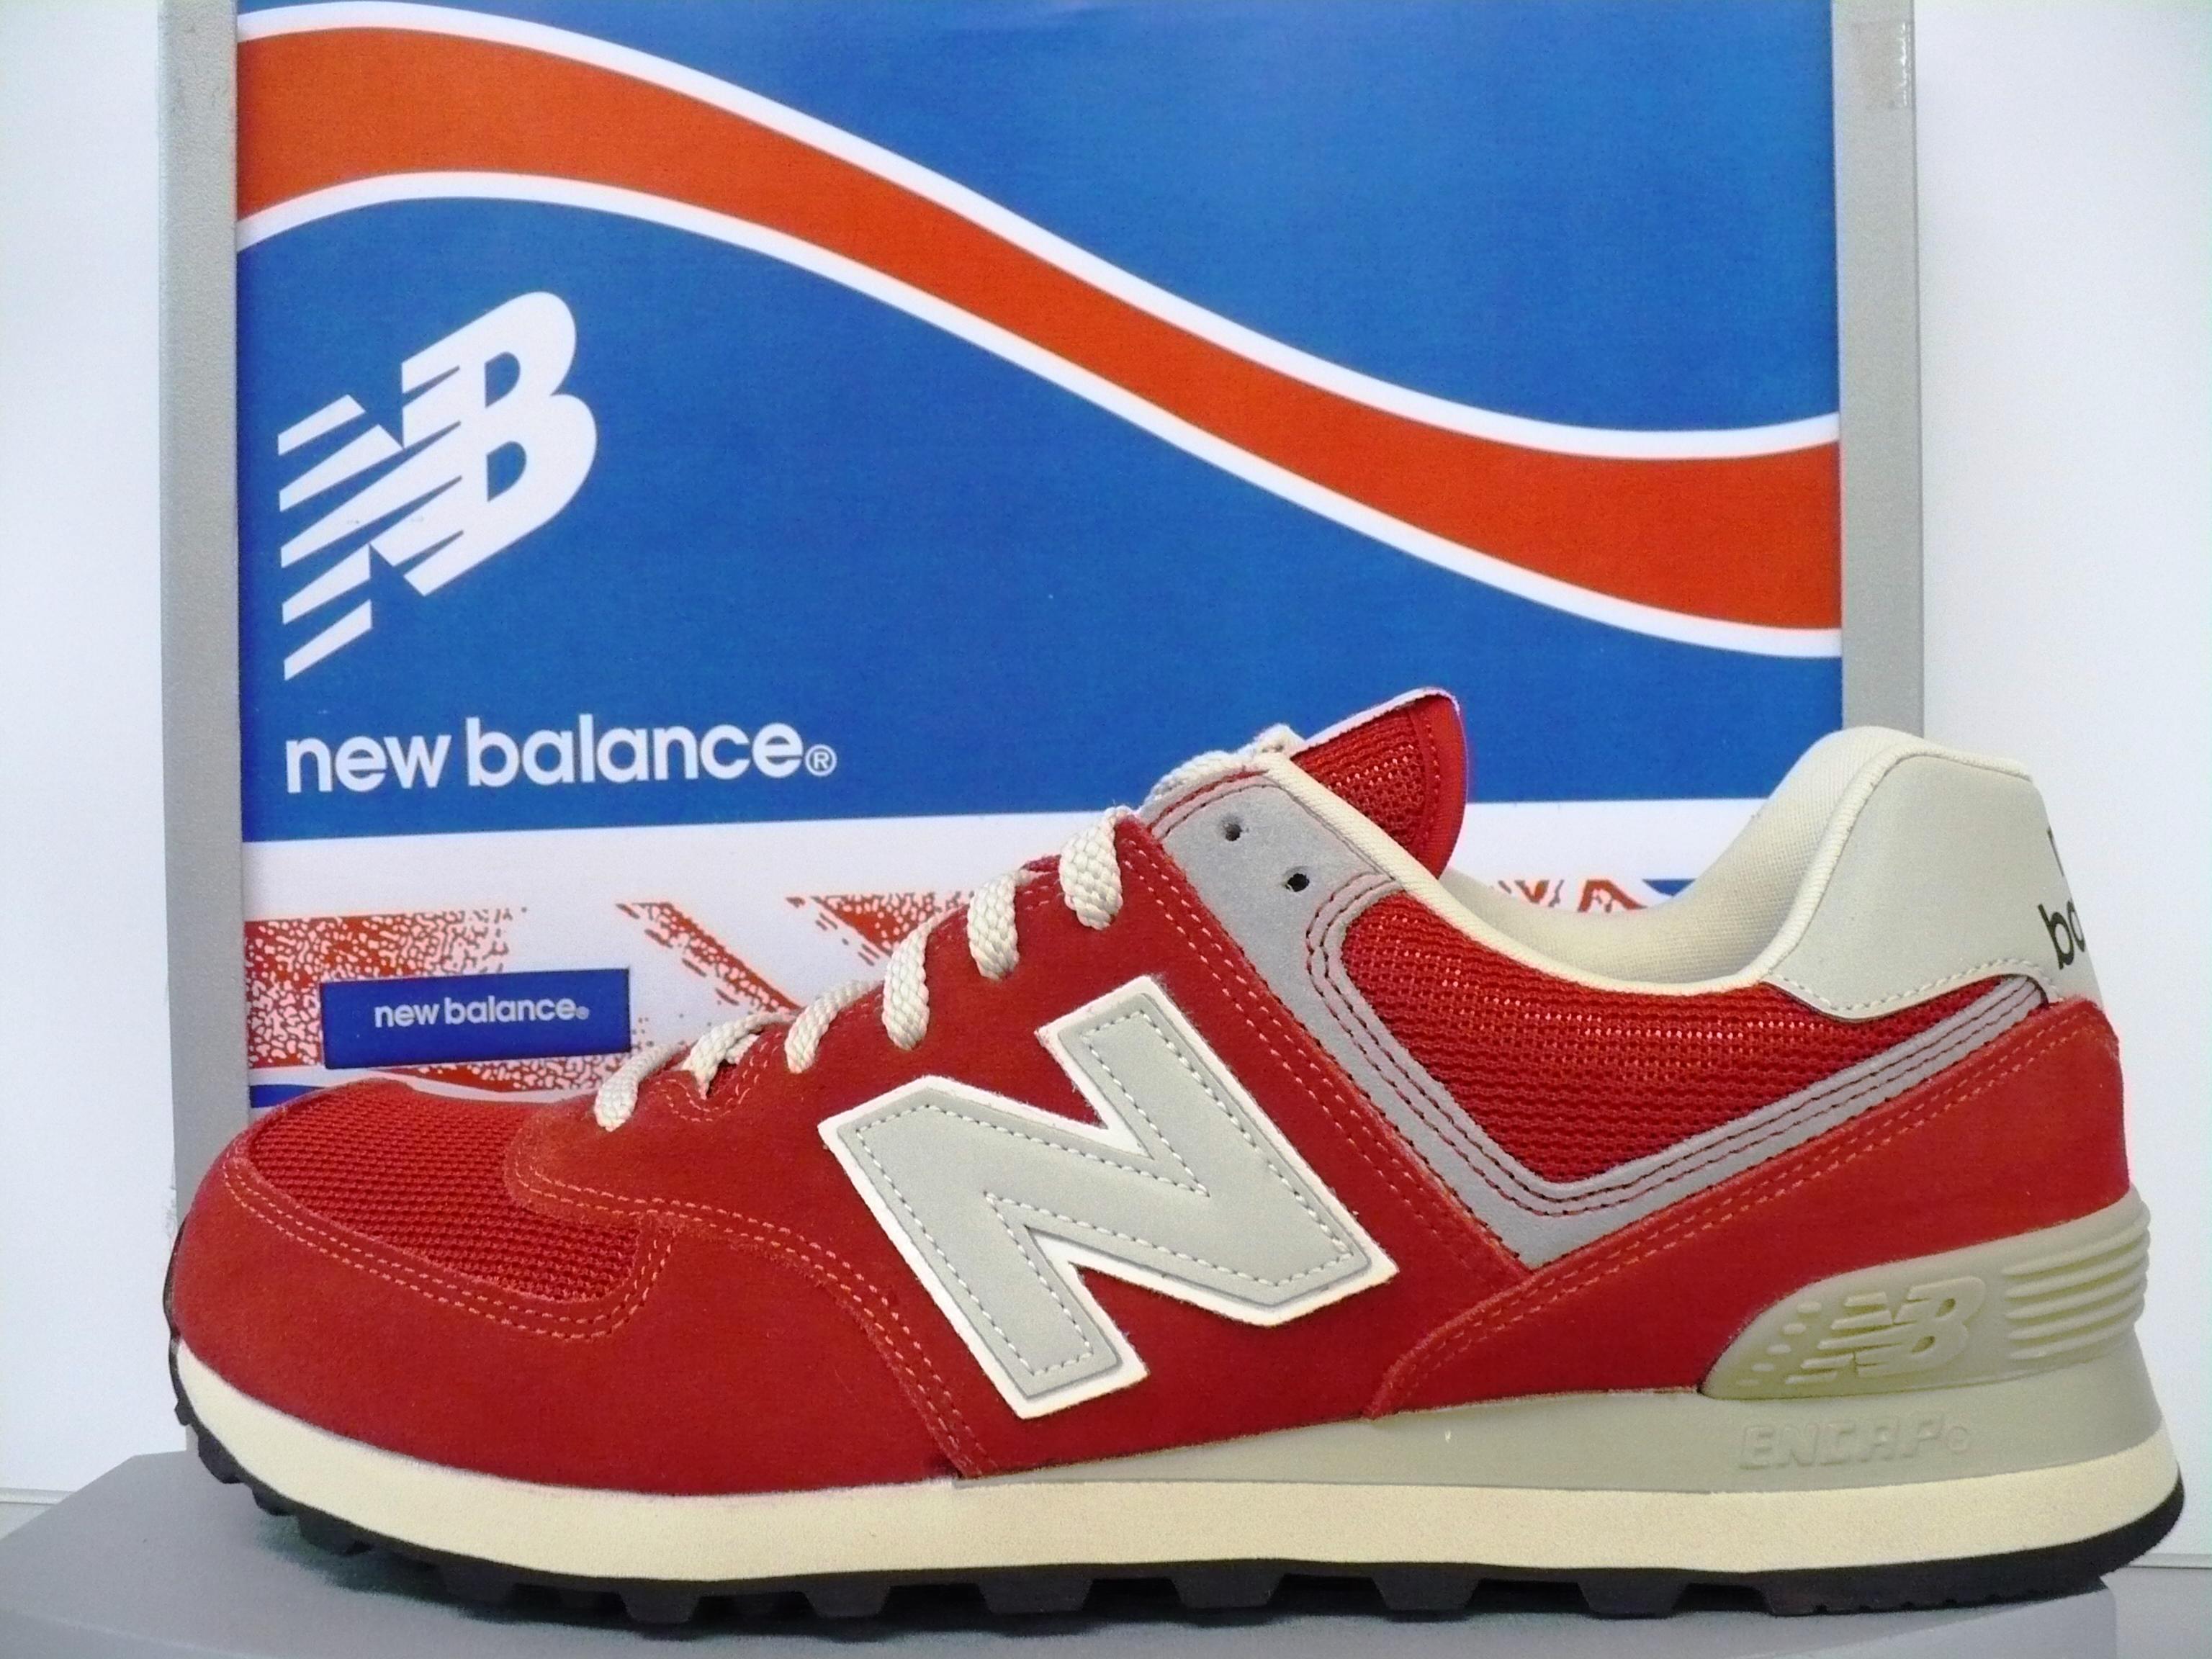 new balance rossa